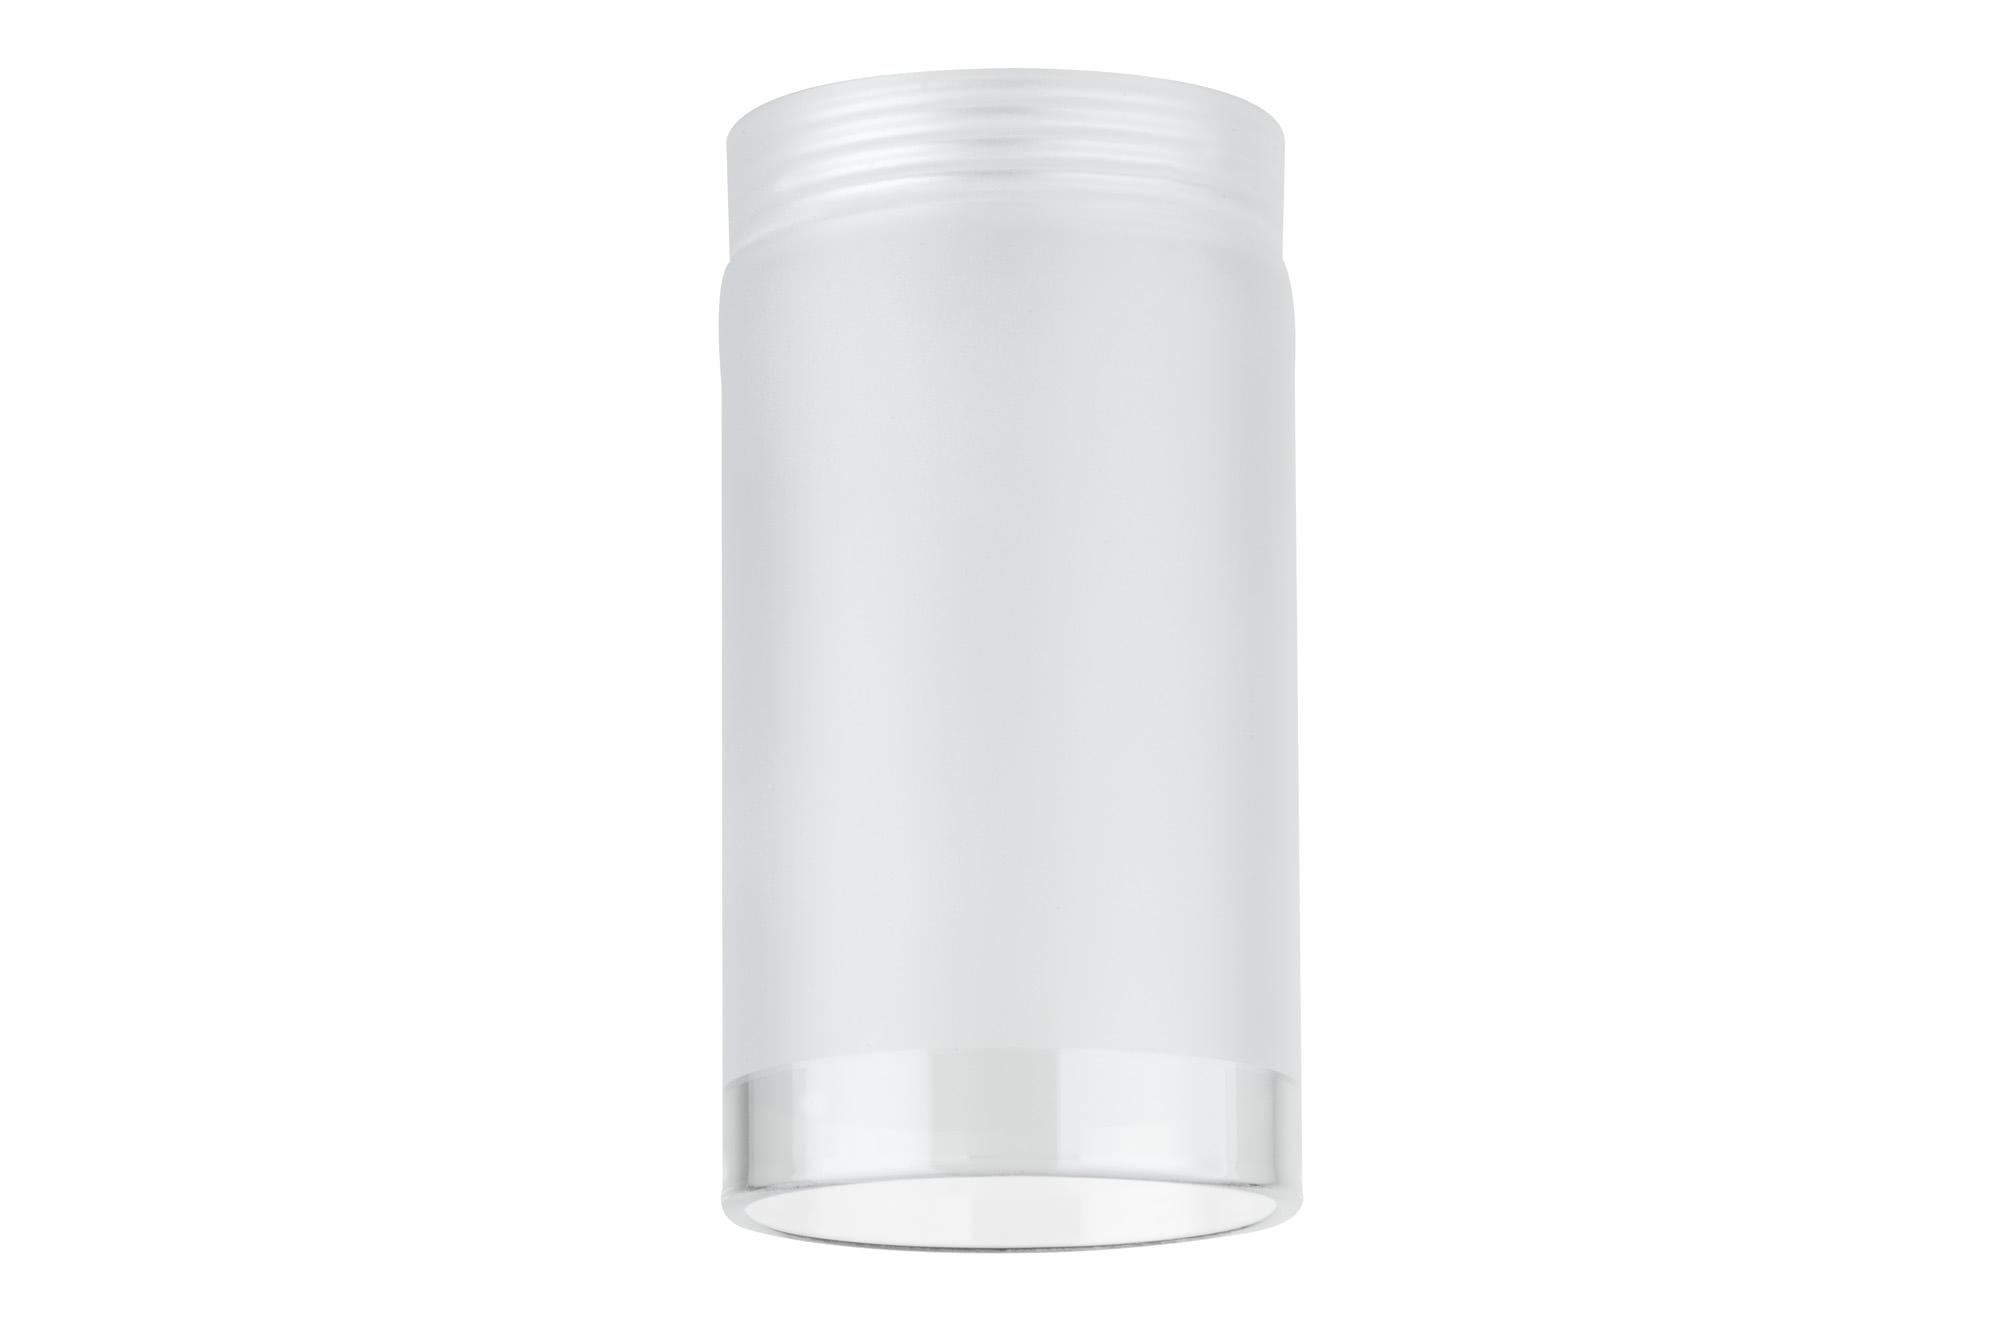 Paulmann. 92573 Плафон для DecoSystems Tube, satin/clear,стекло